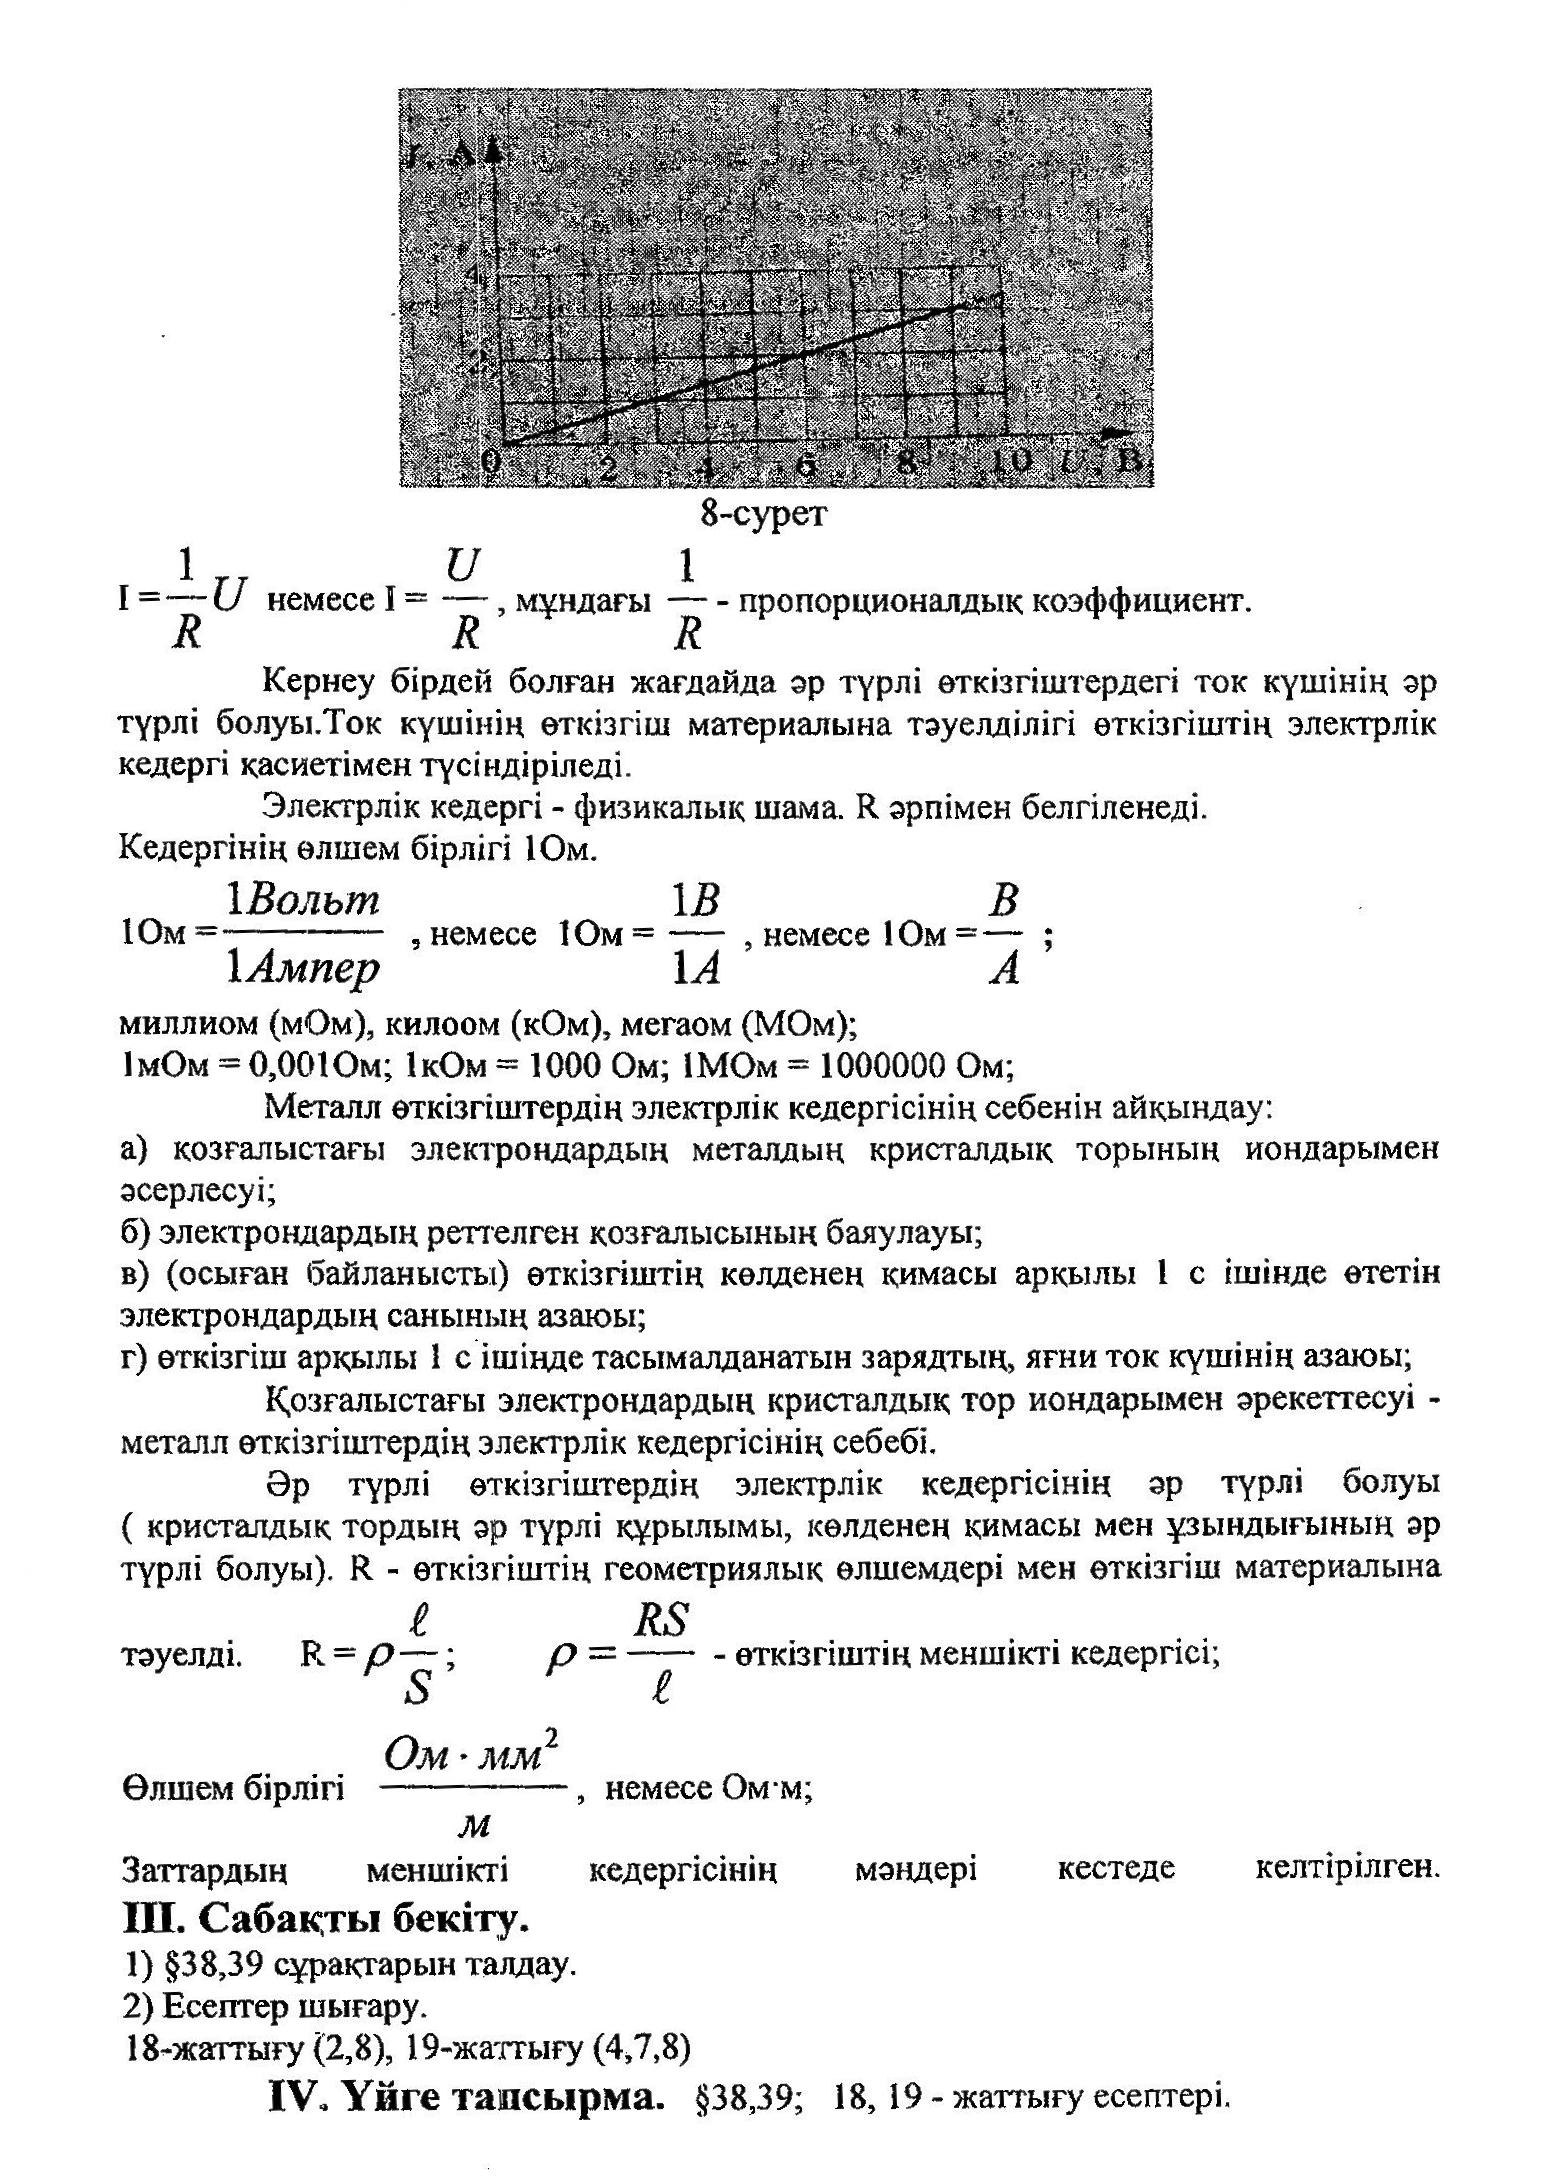 C:\Documents and Settings\Арайлым\Рабочий стол\8 class\Новая папка\45.jpg